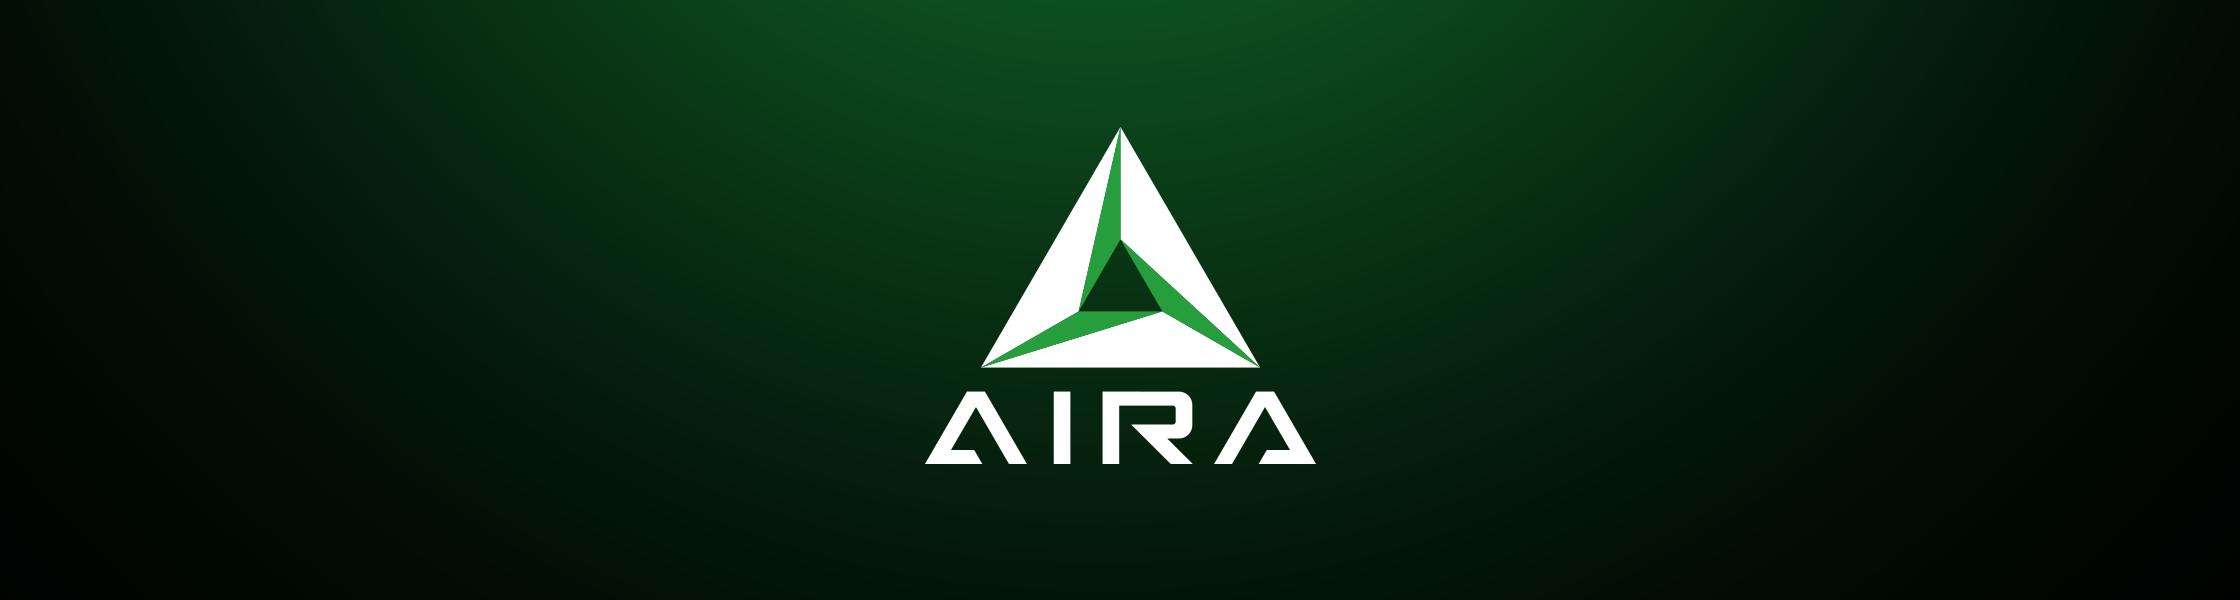 AIRA.png